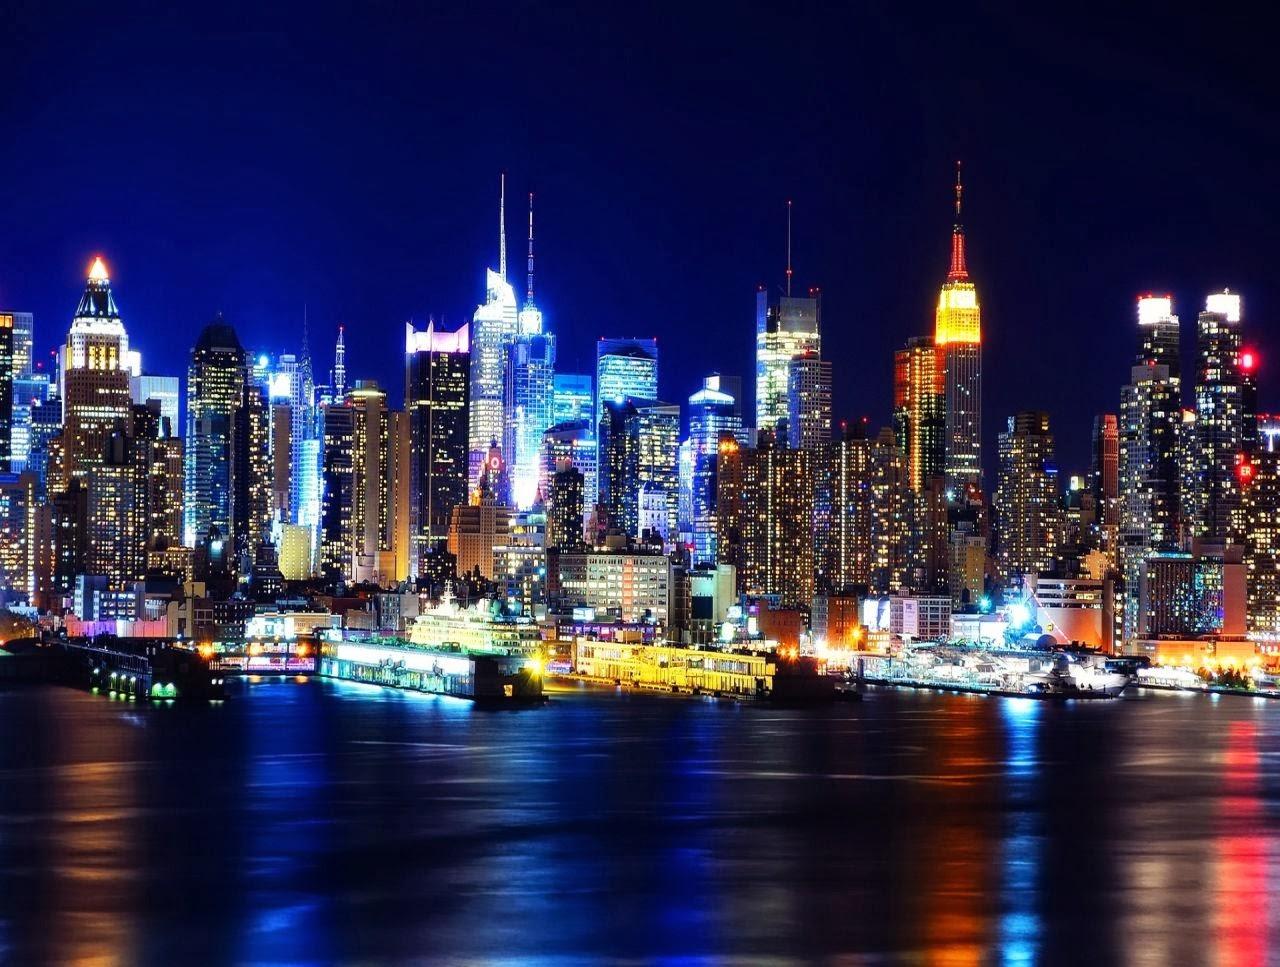 New York City Wallpapers ~ WallpaperYork | Brows your ...